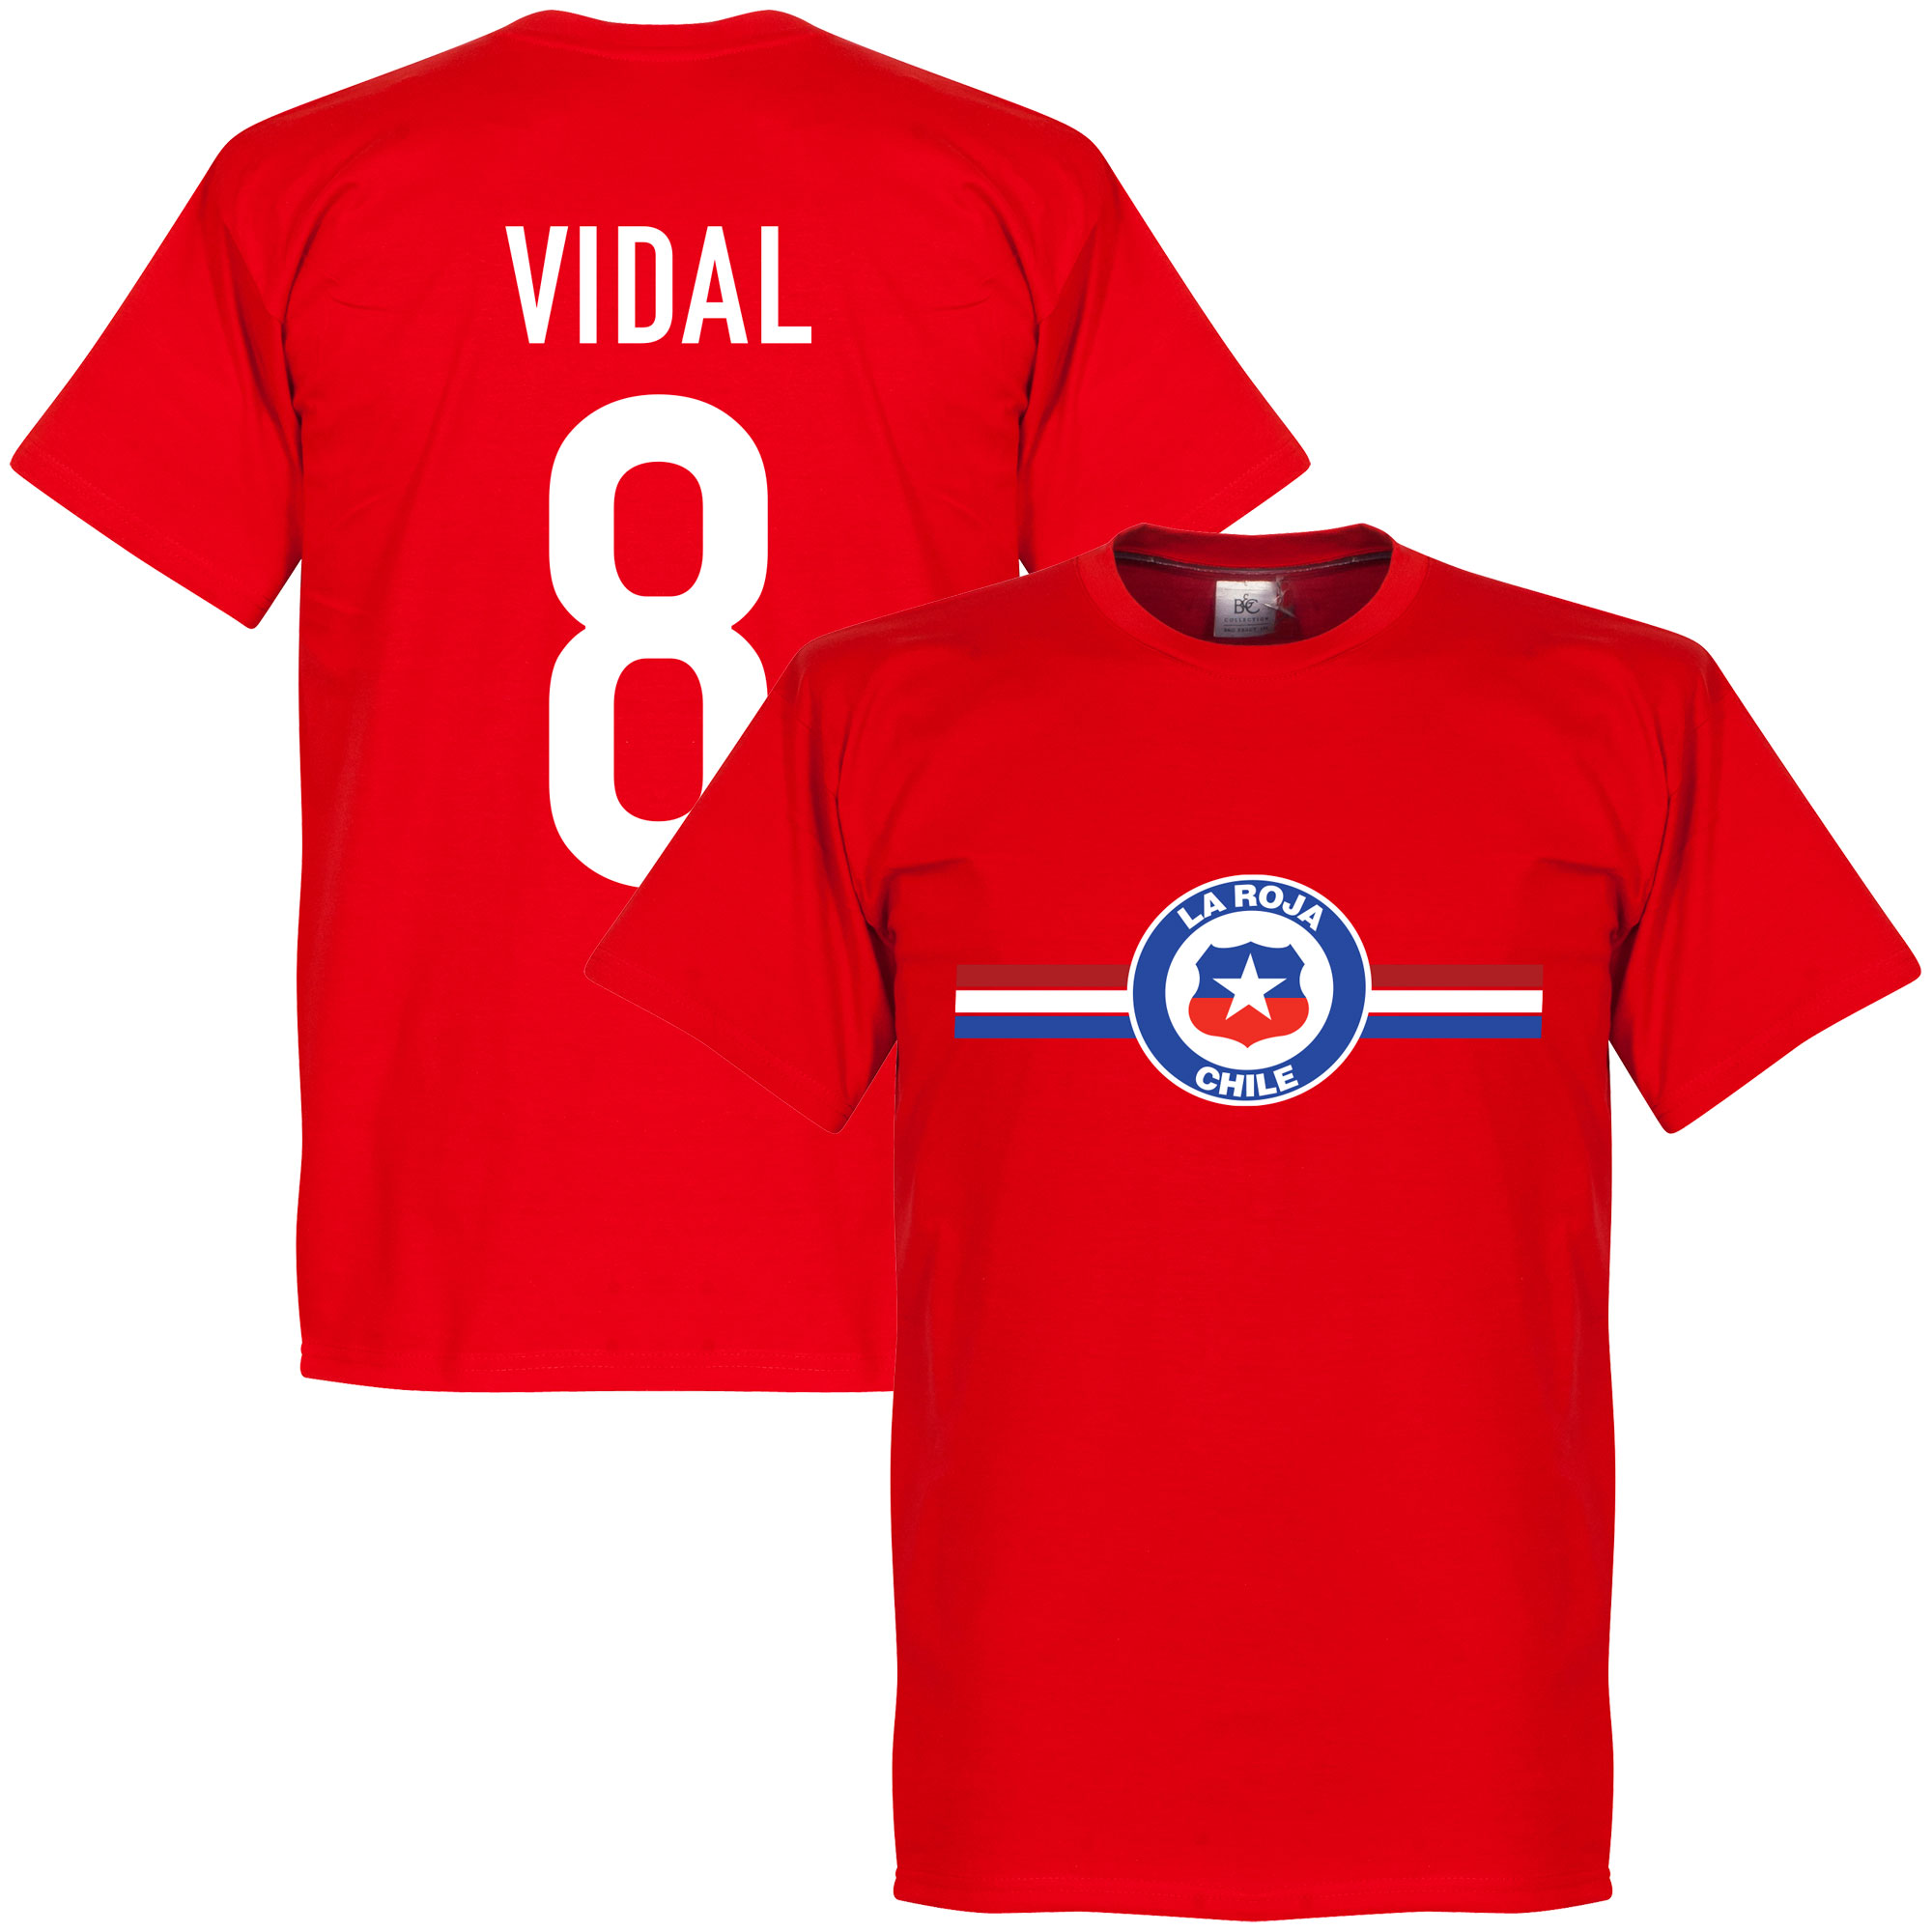 Chile Vidal Tee - Red - XXXL